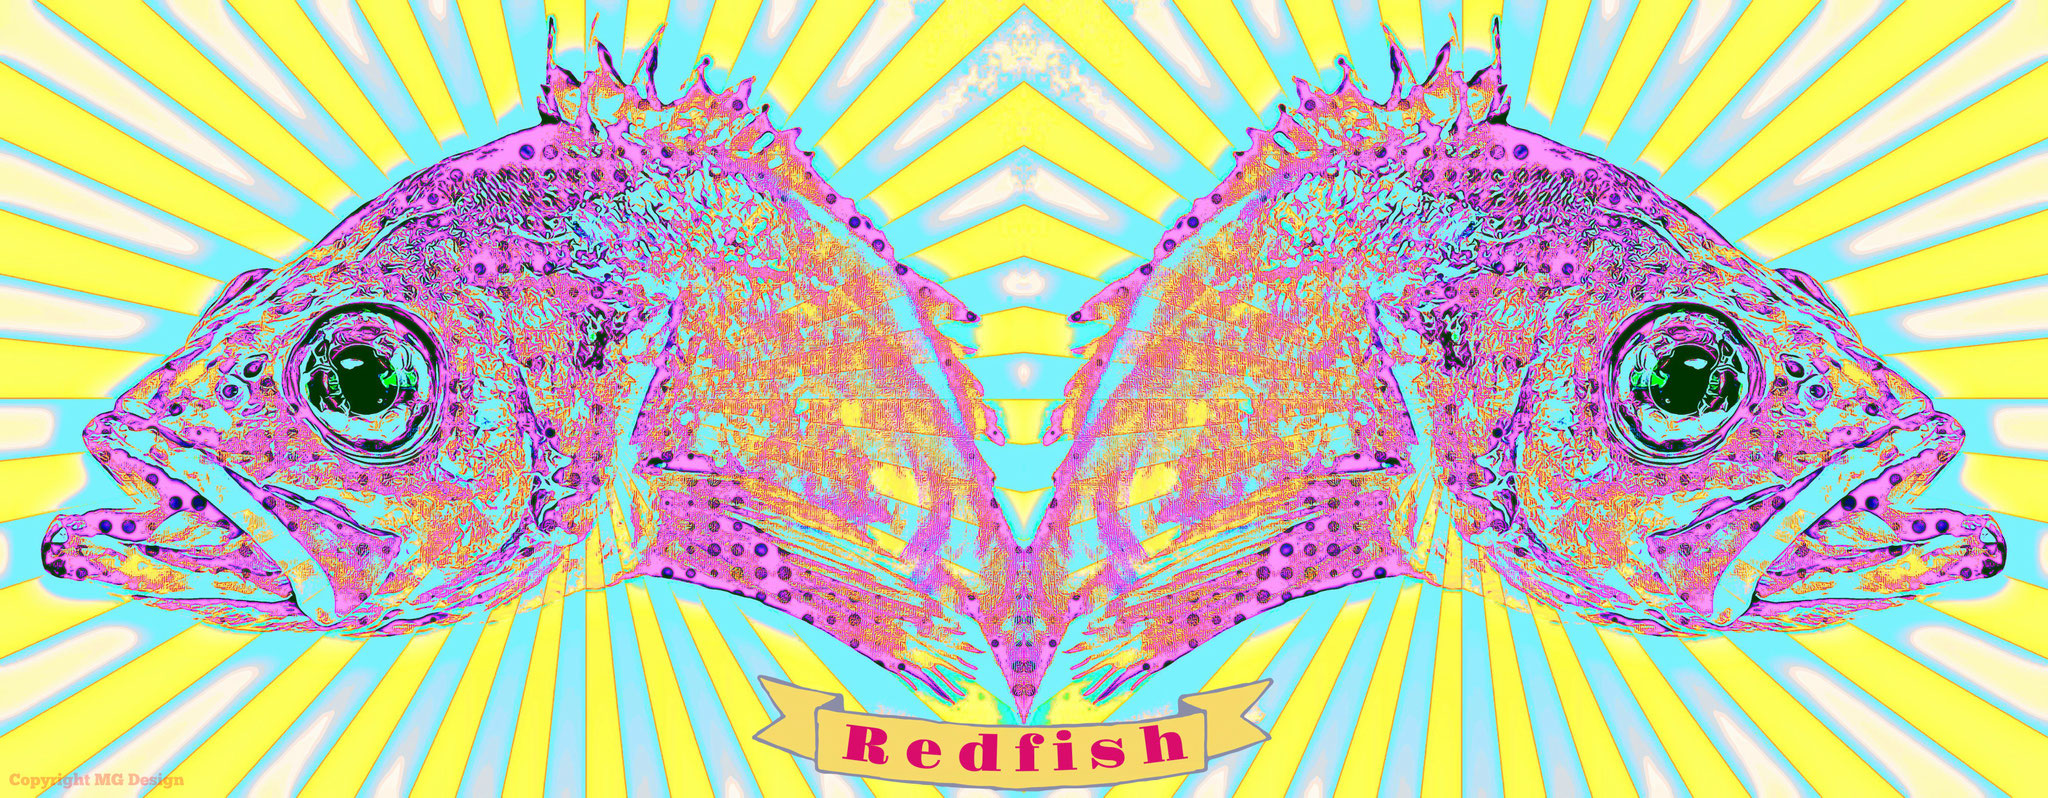 Redfish 3 (Roodbaars)